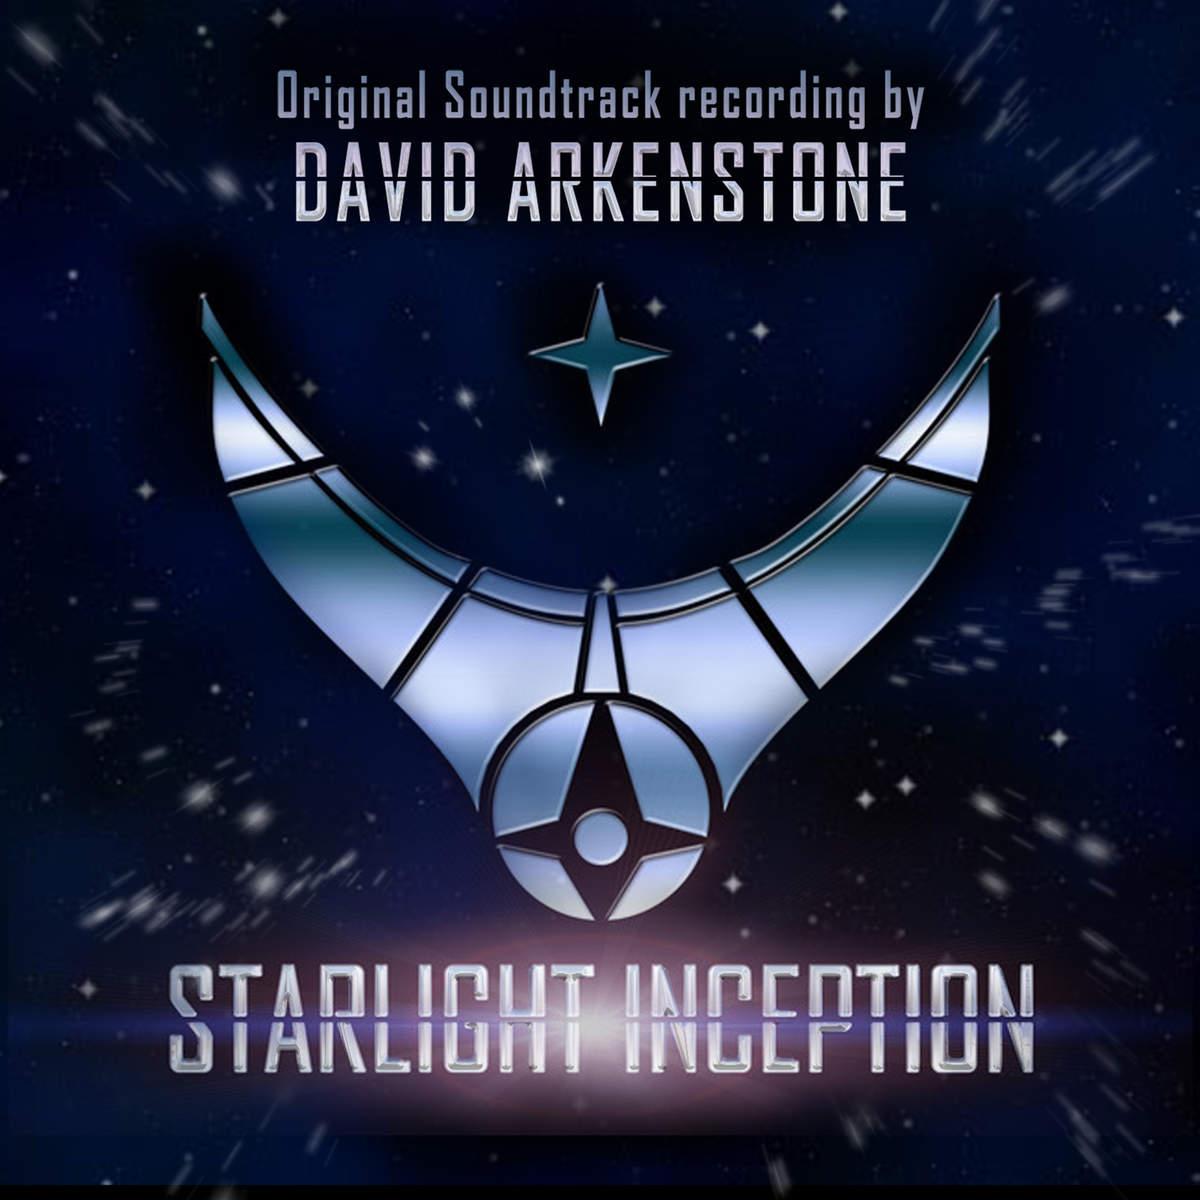 Starlight_Inception_Original_Soundtrack__cover1200x1200.jpeg